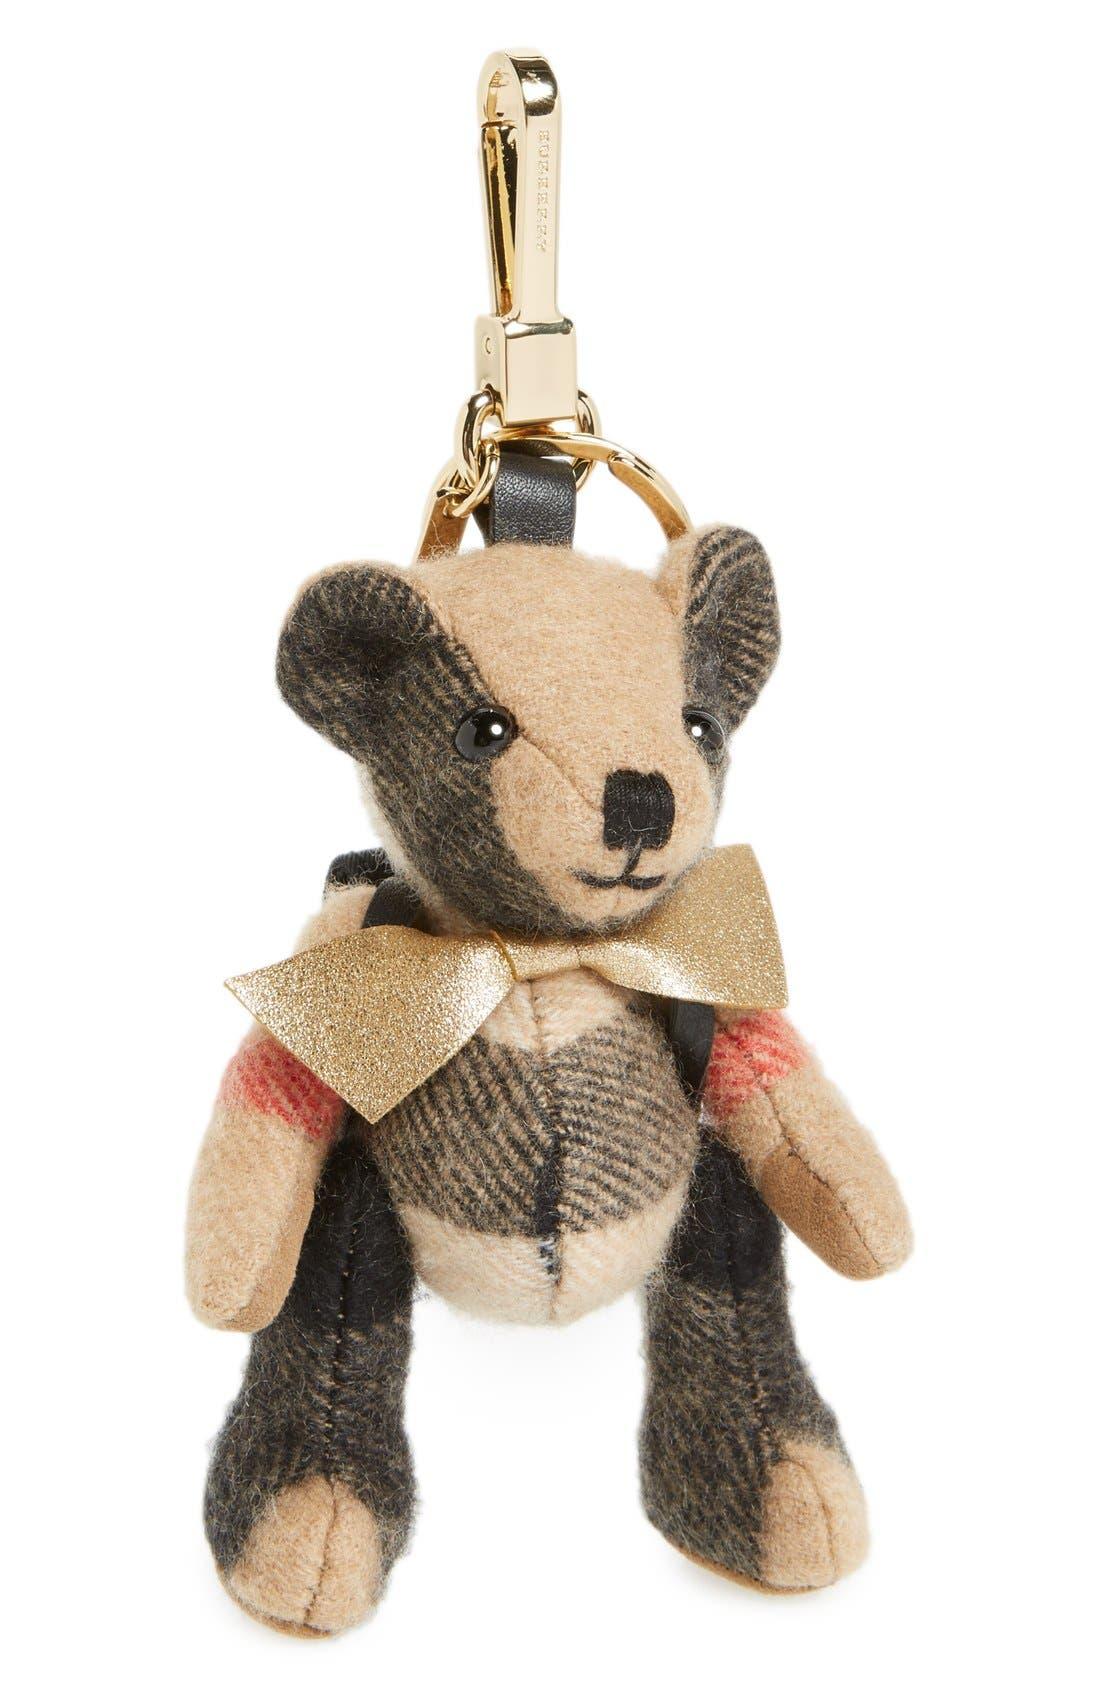 Burberry 'Thomas Rucksack Bear' Check Cashmere Bag Charm